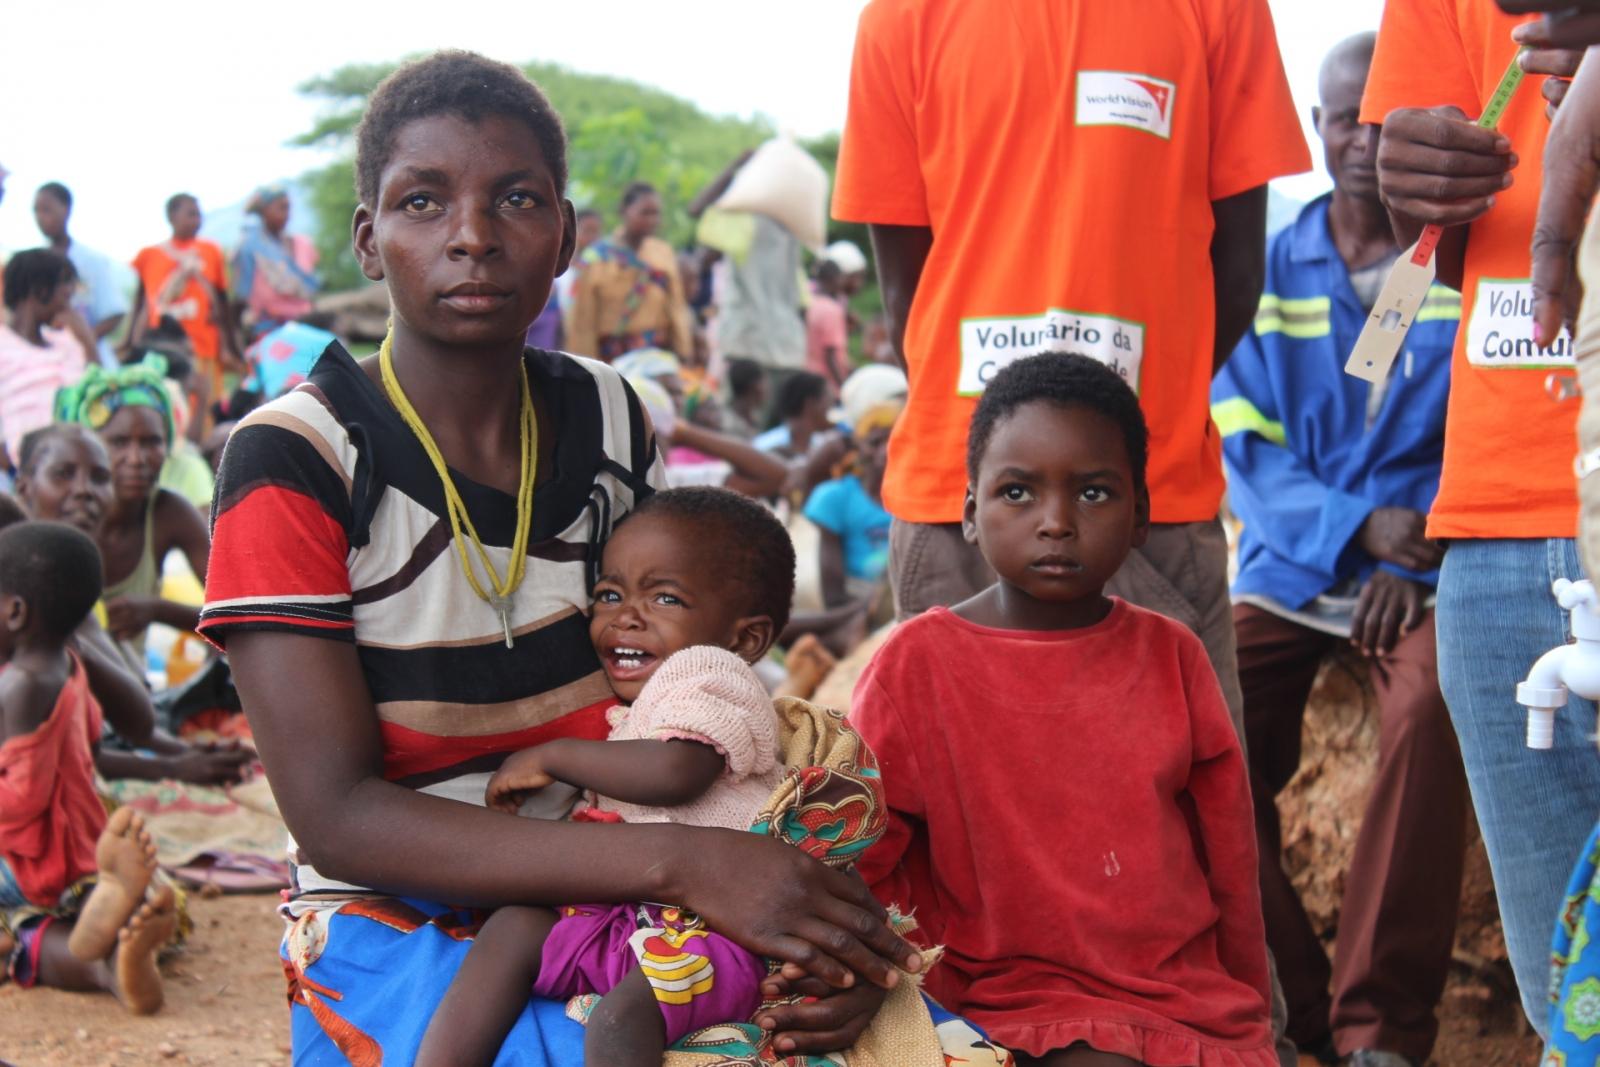 Malnutrition screening in Mozambique